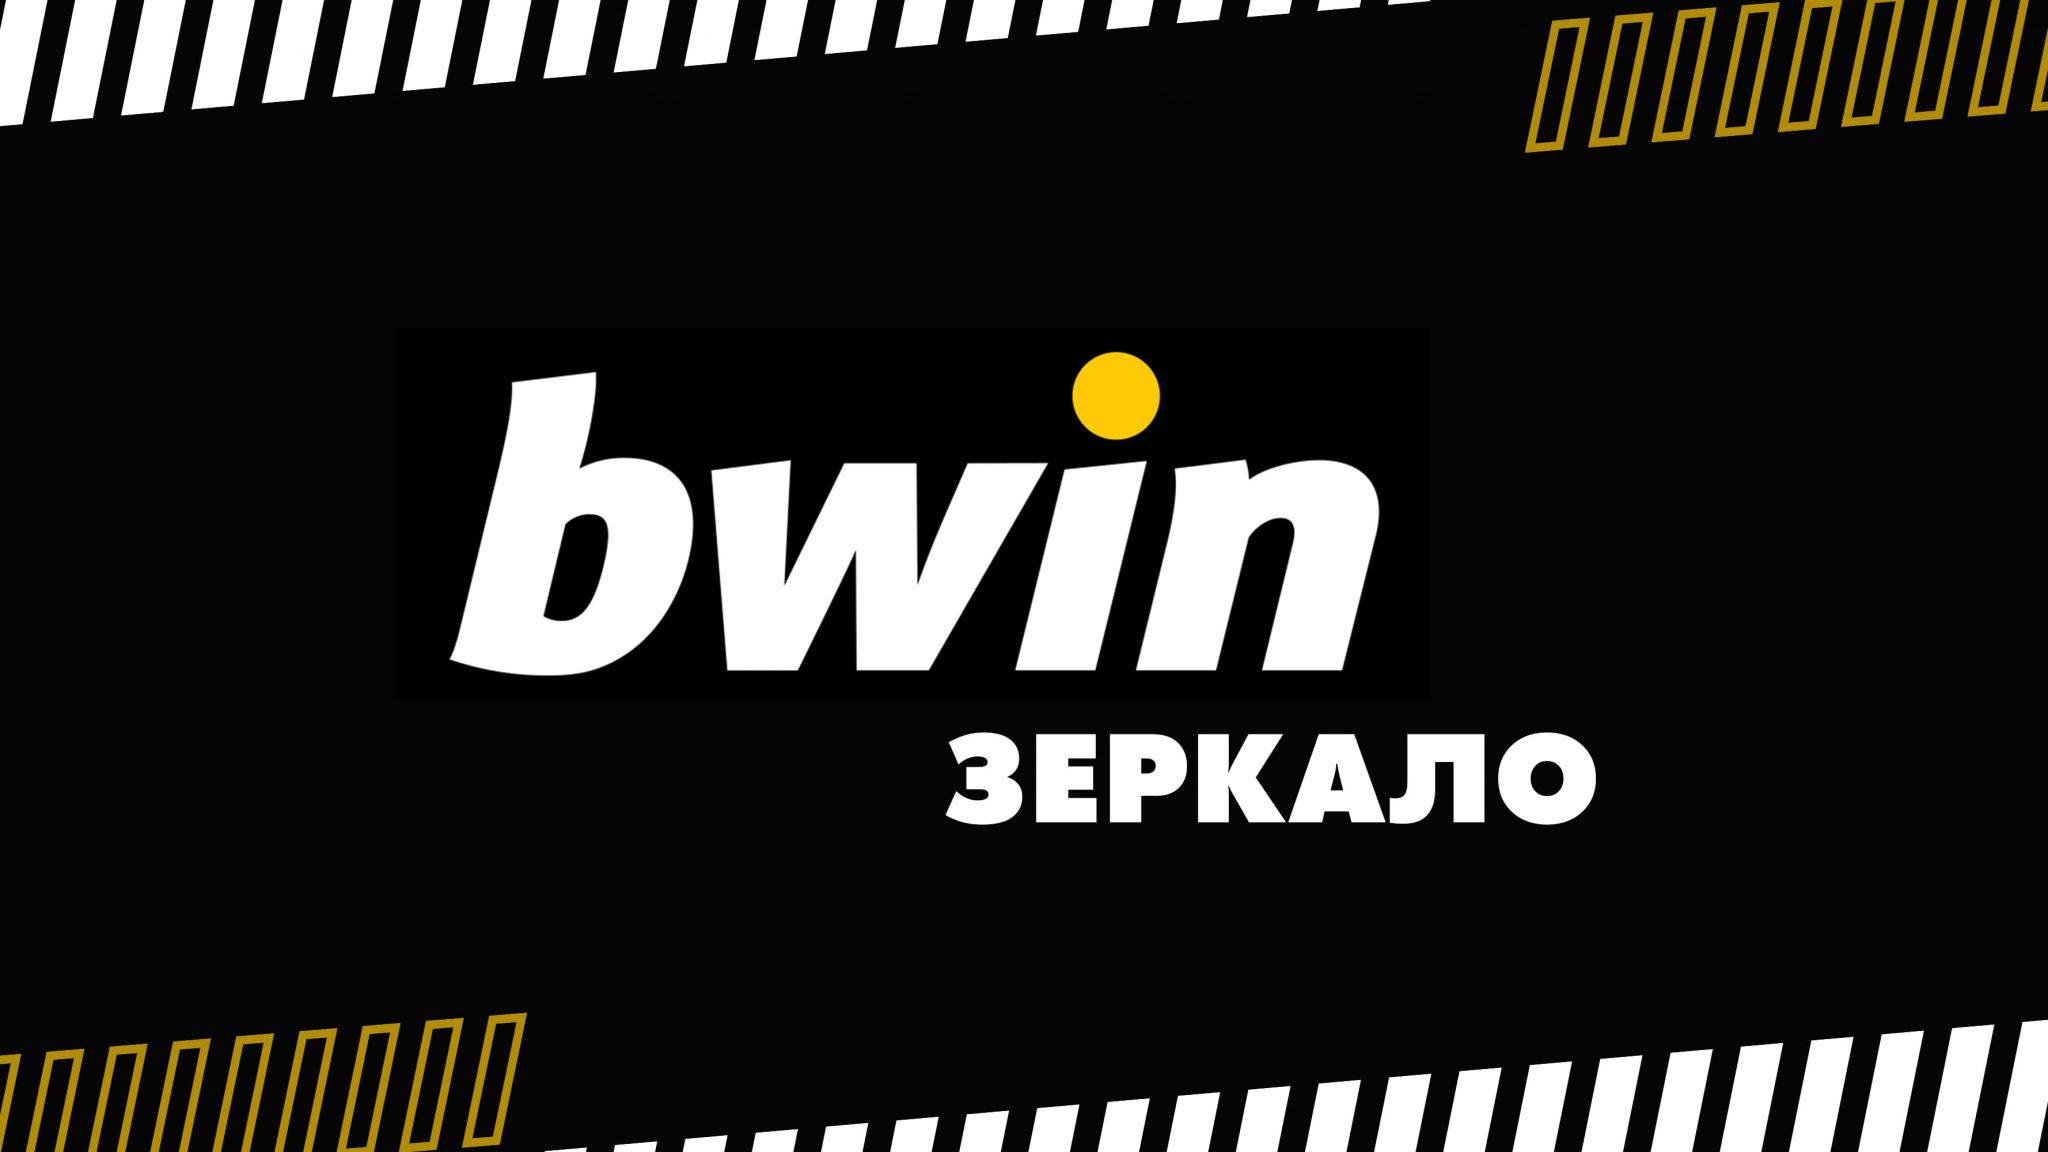 ЧТО ТАКОЕ ЗЕРКАЛО BWIN?